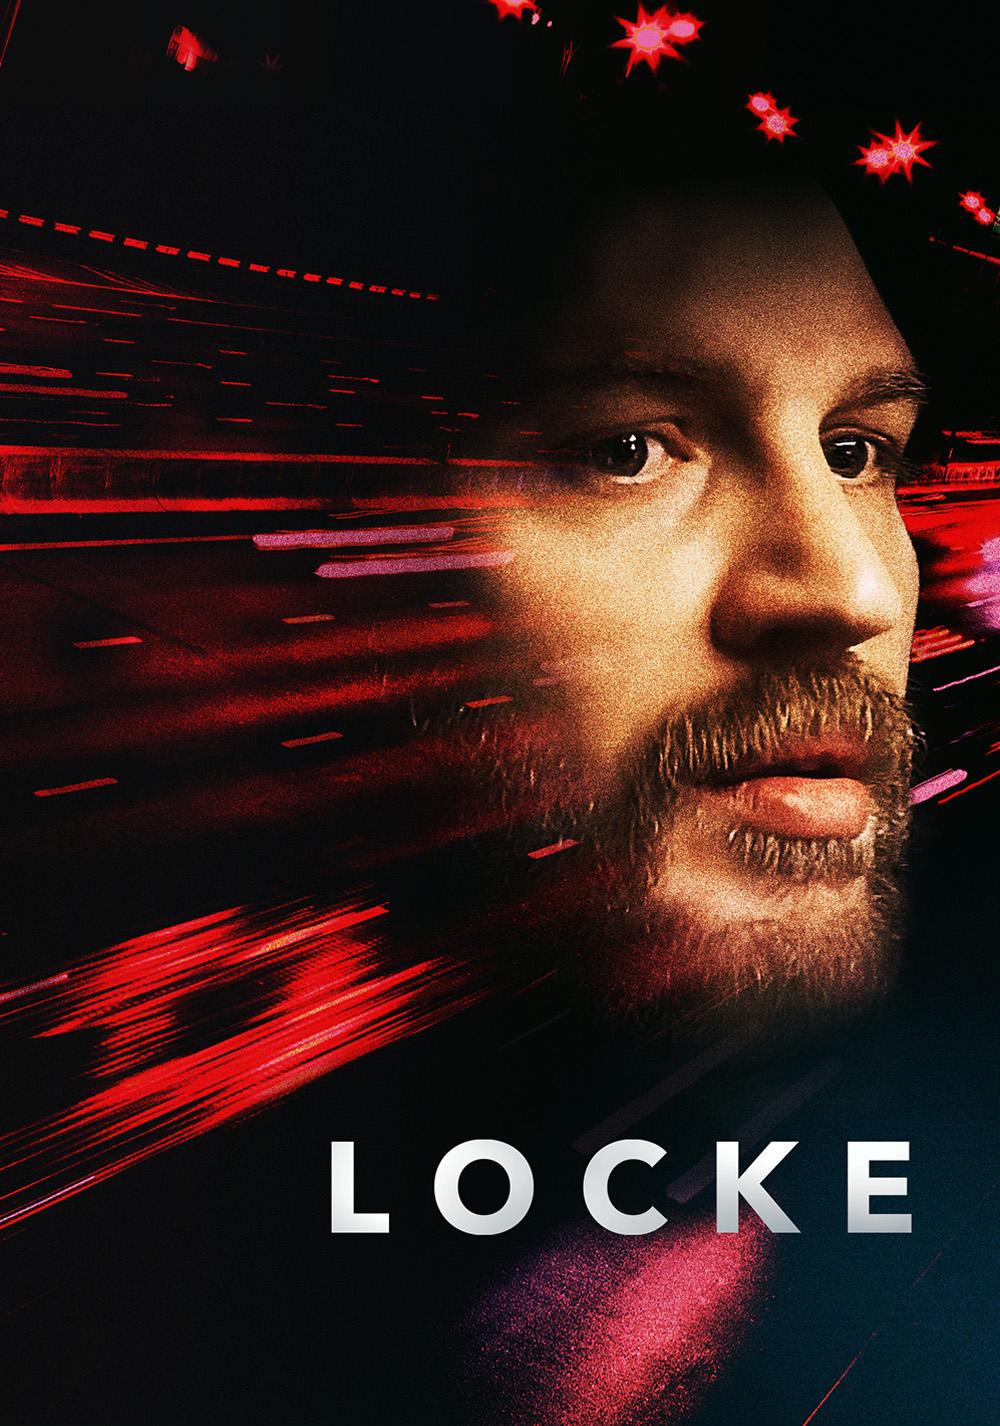 Locke Film